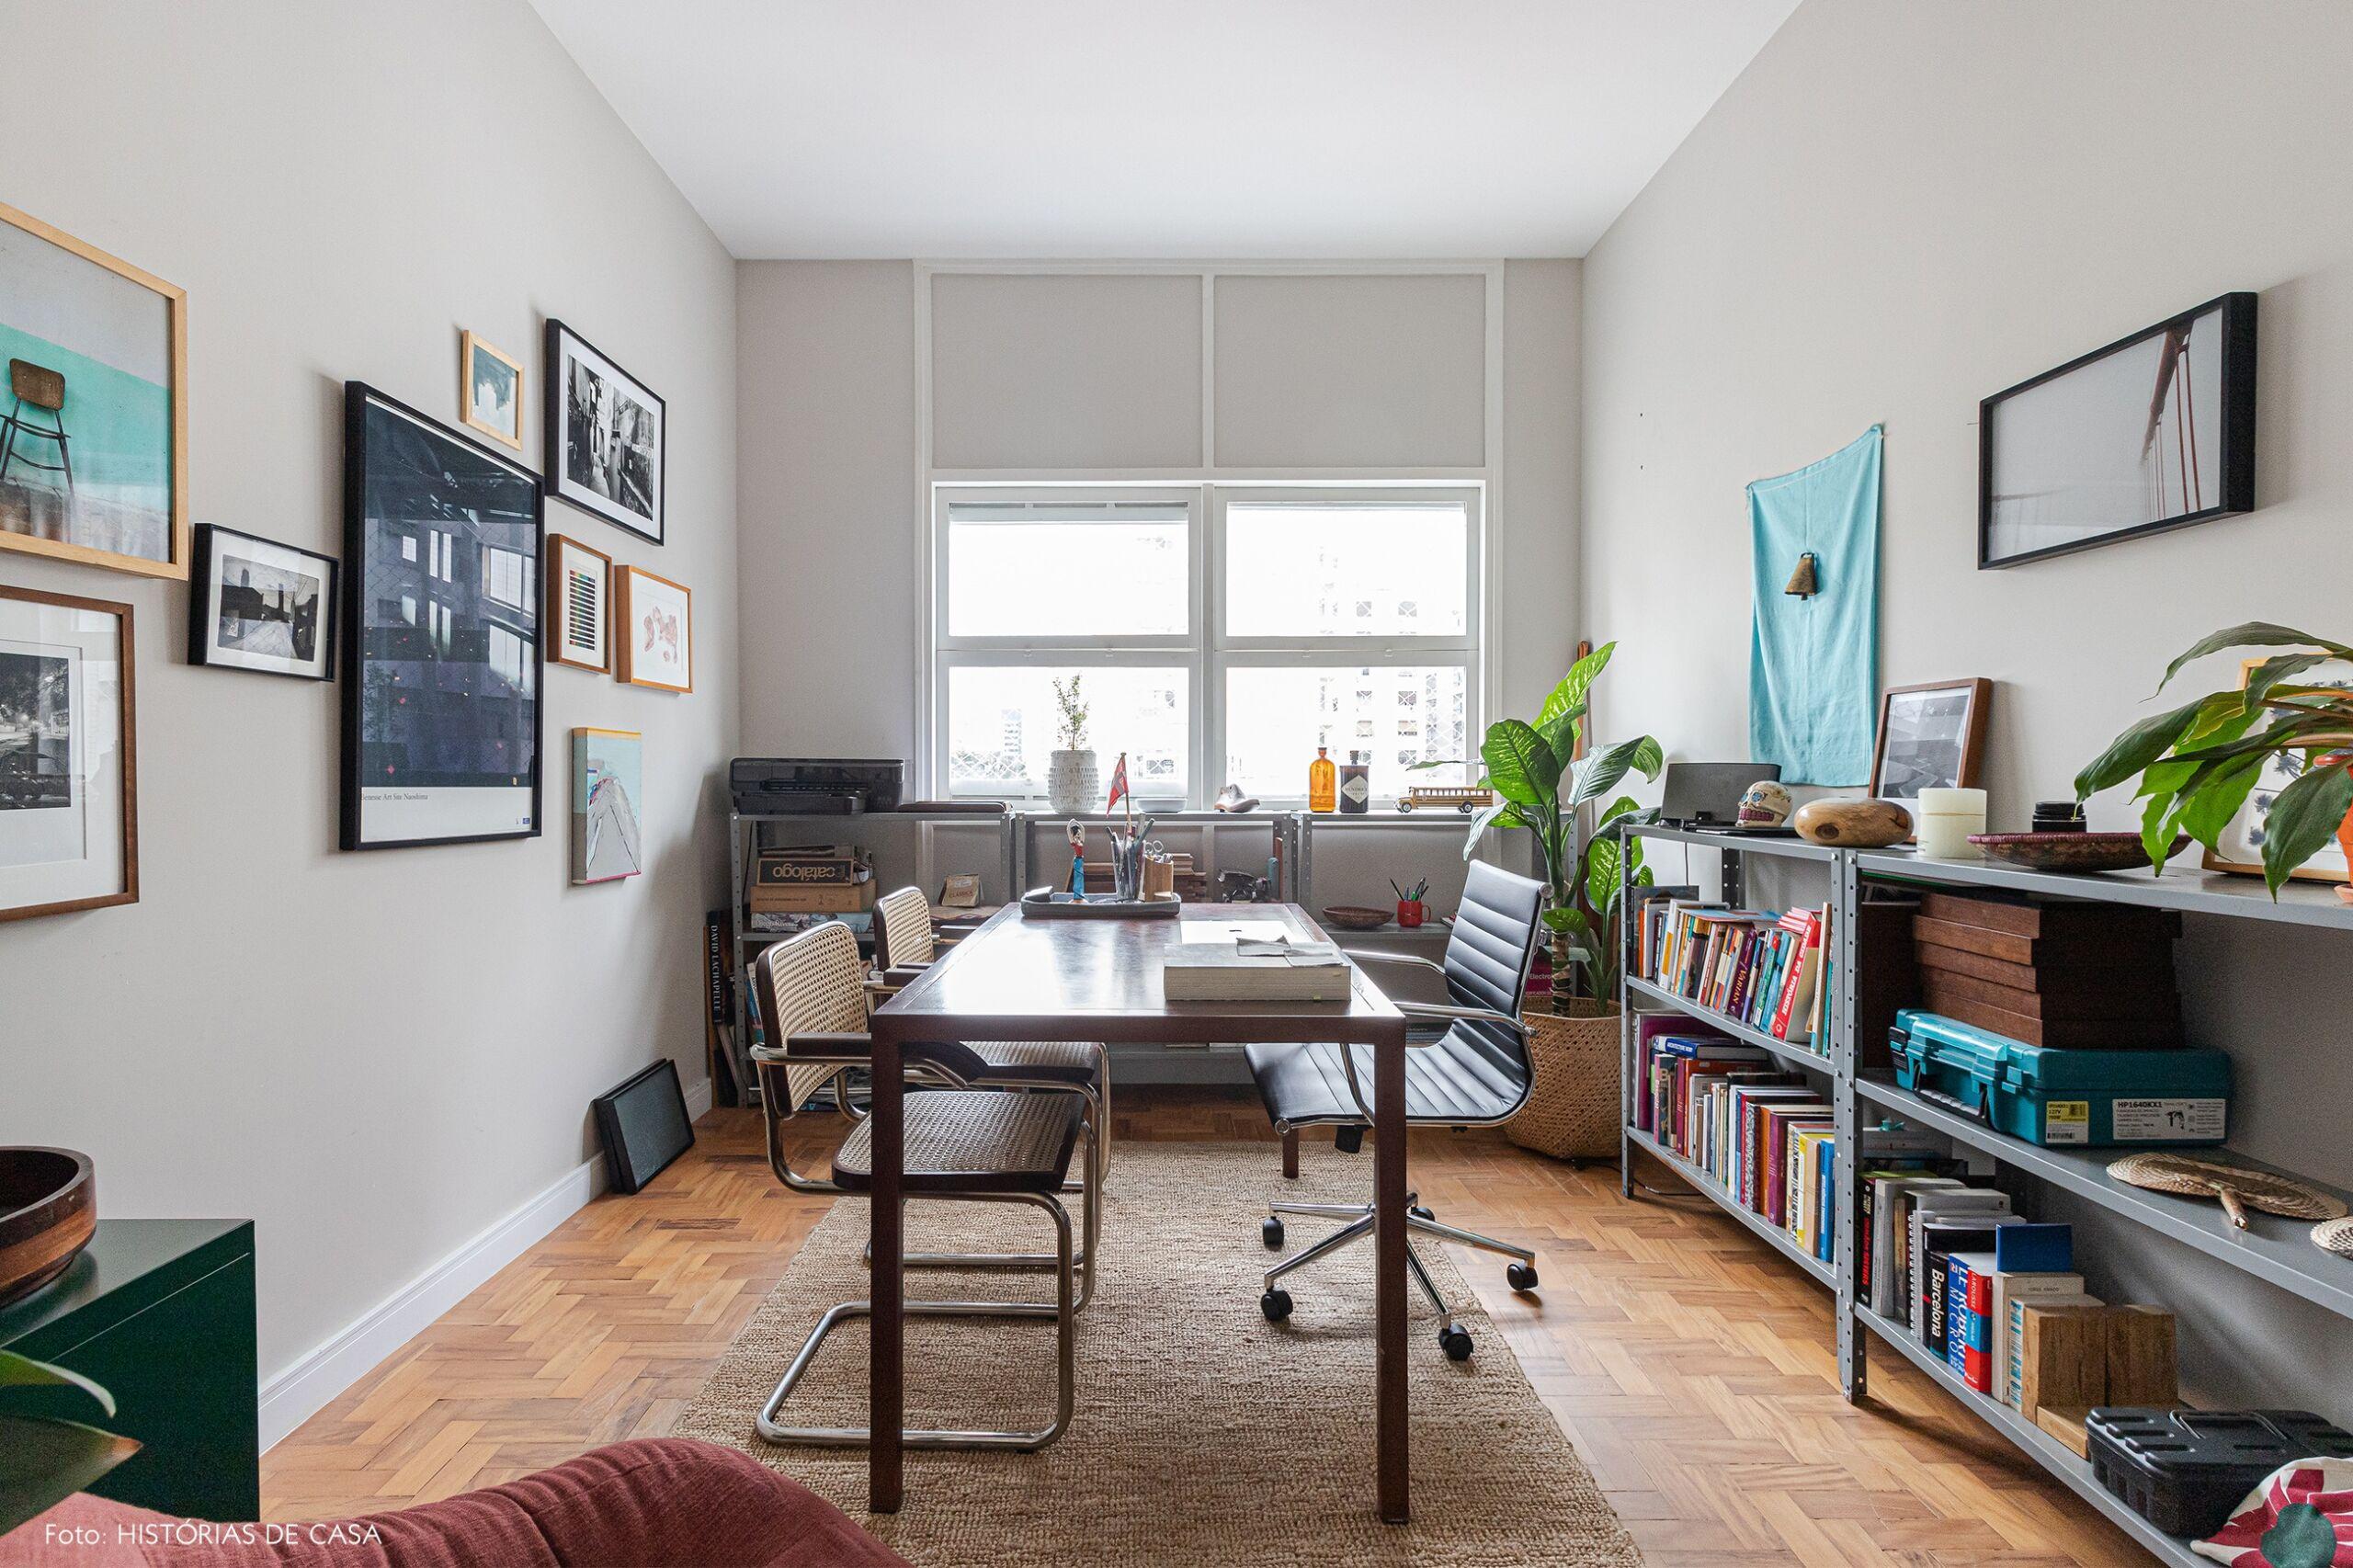 home-office-mesa-cadeira-madeira-prateleira-cinza